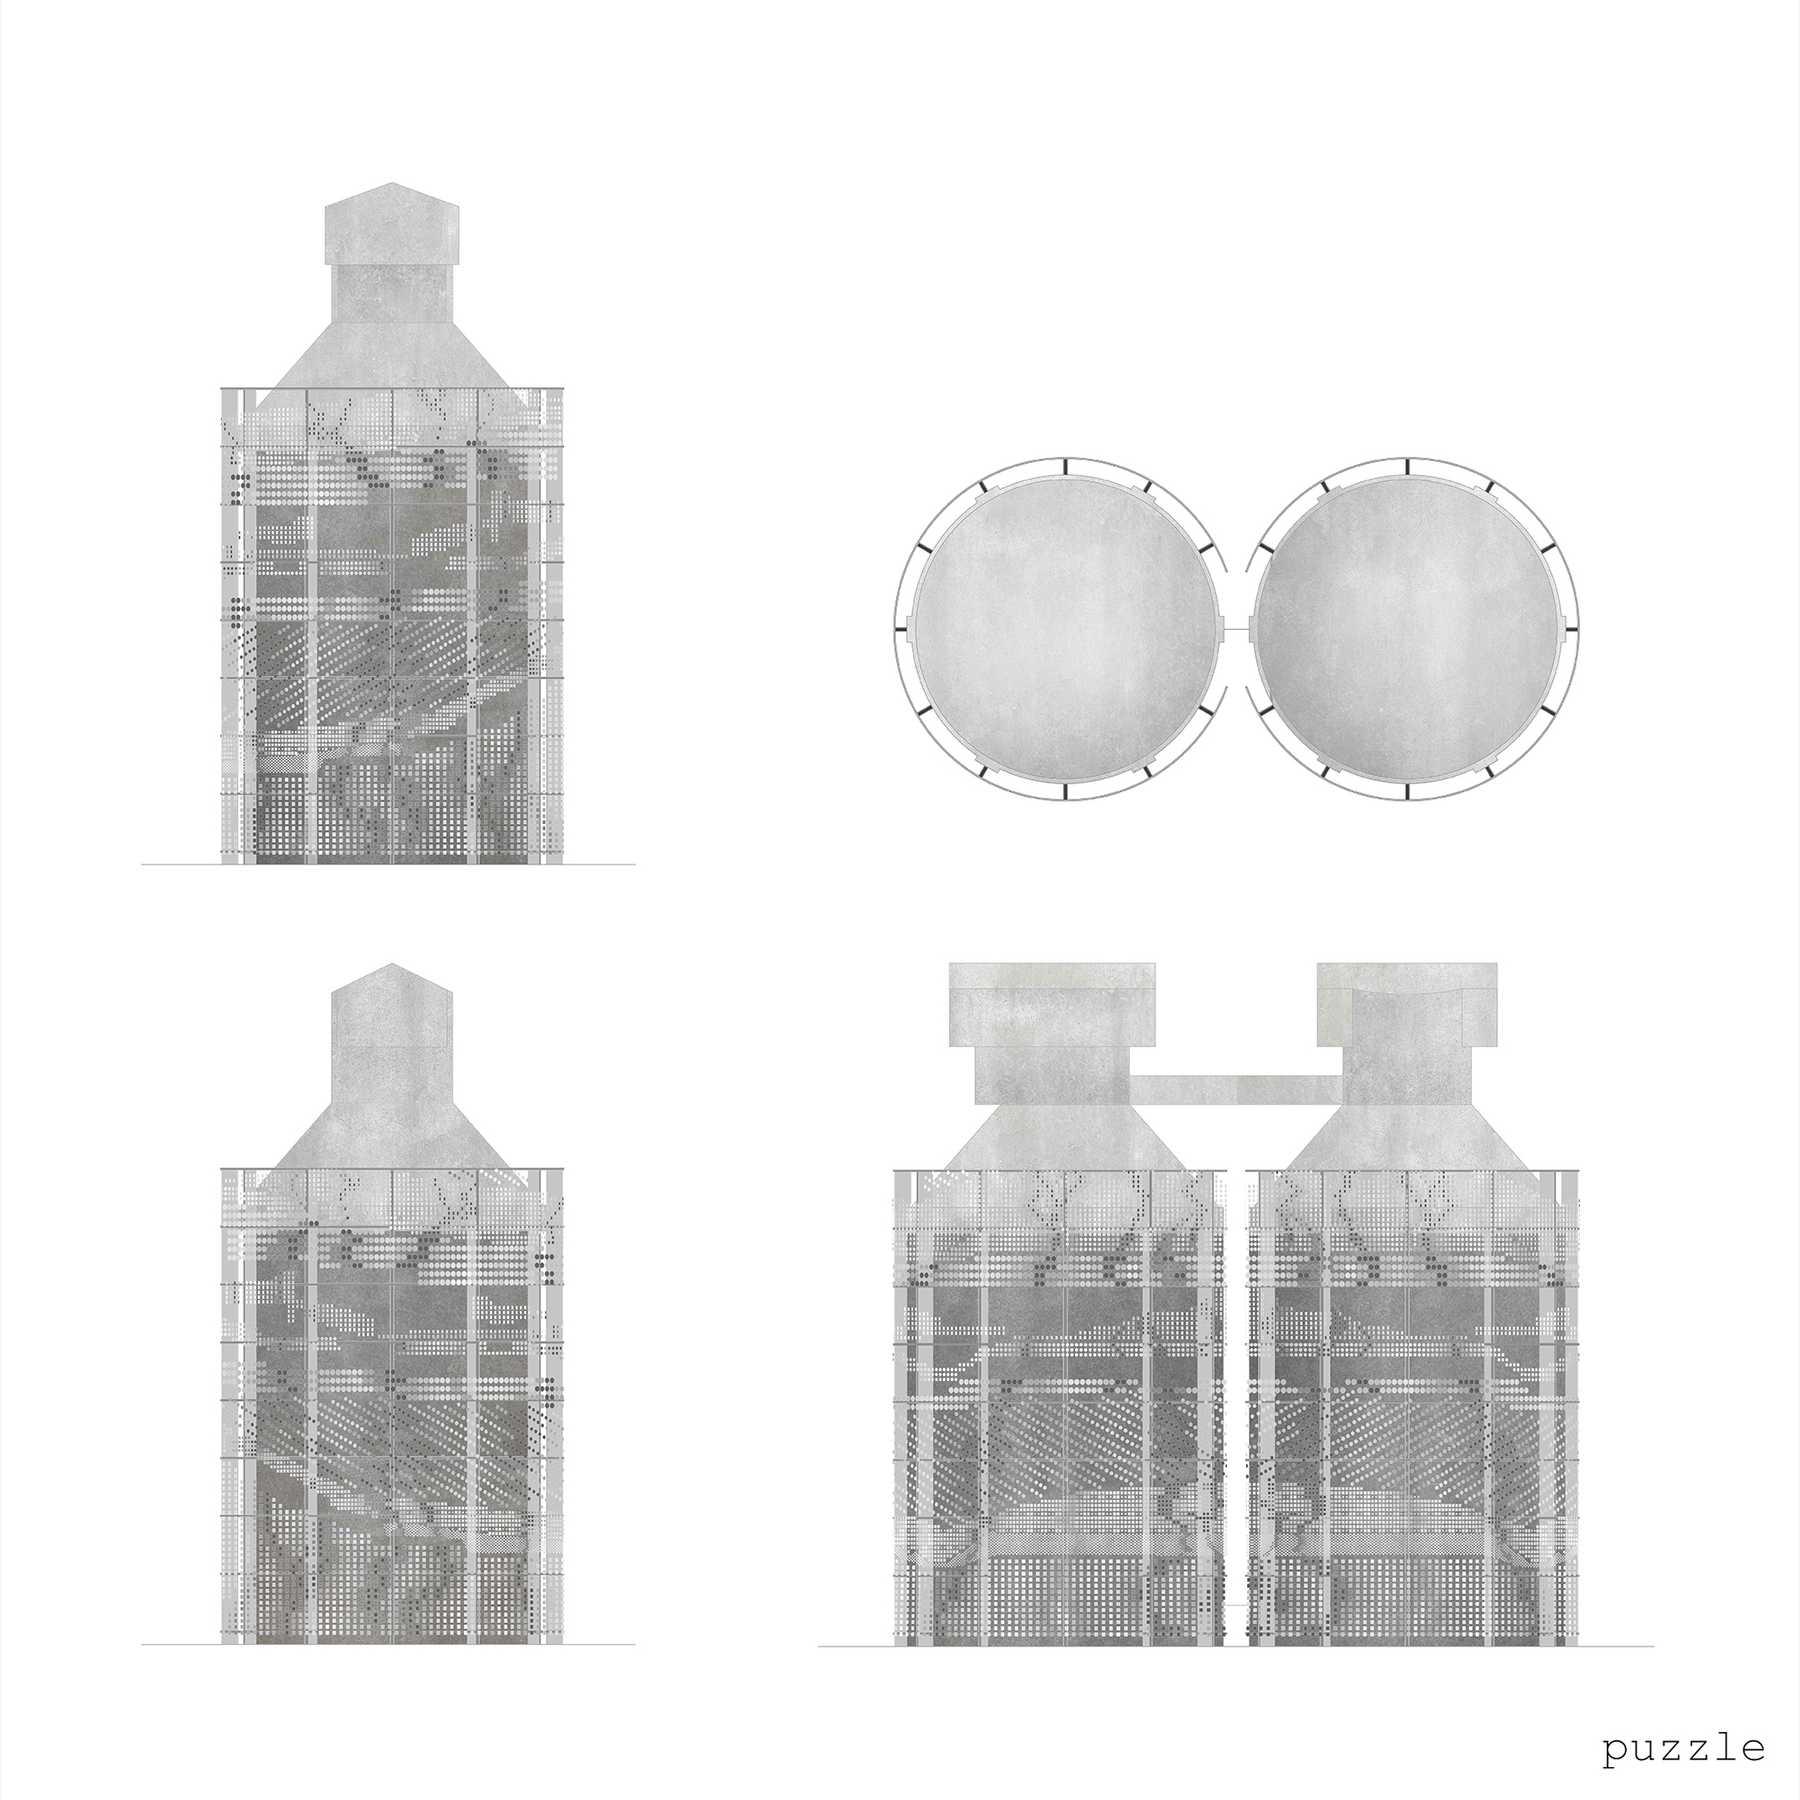 dynamic-facade-1.jpg